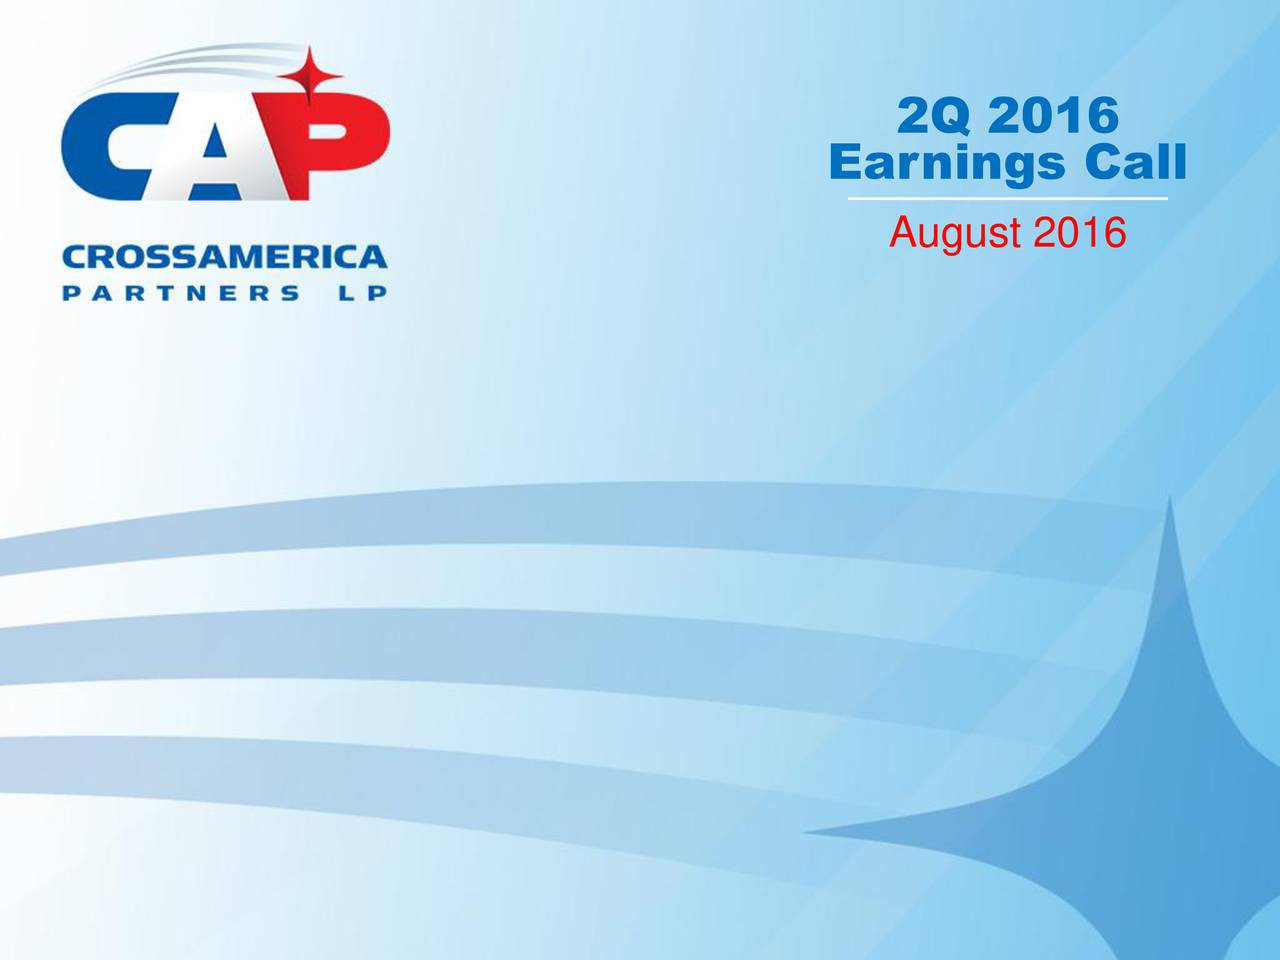 Earnings Call August 2016